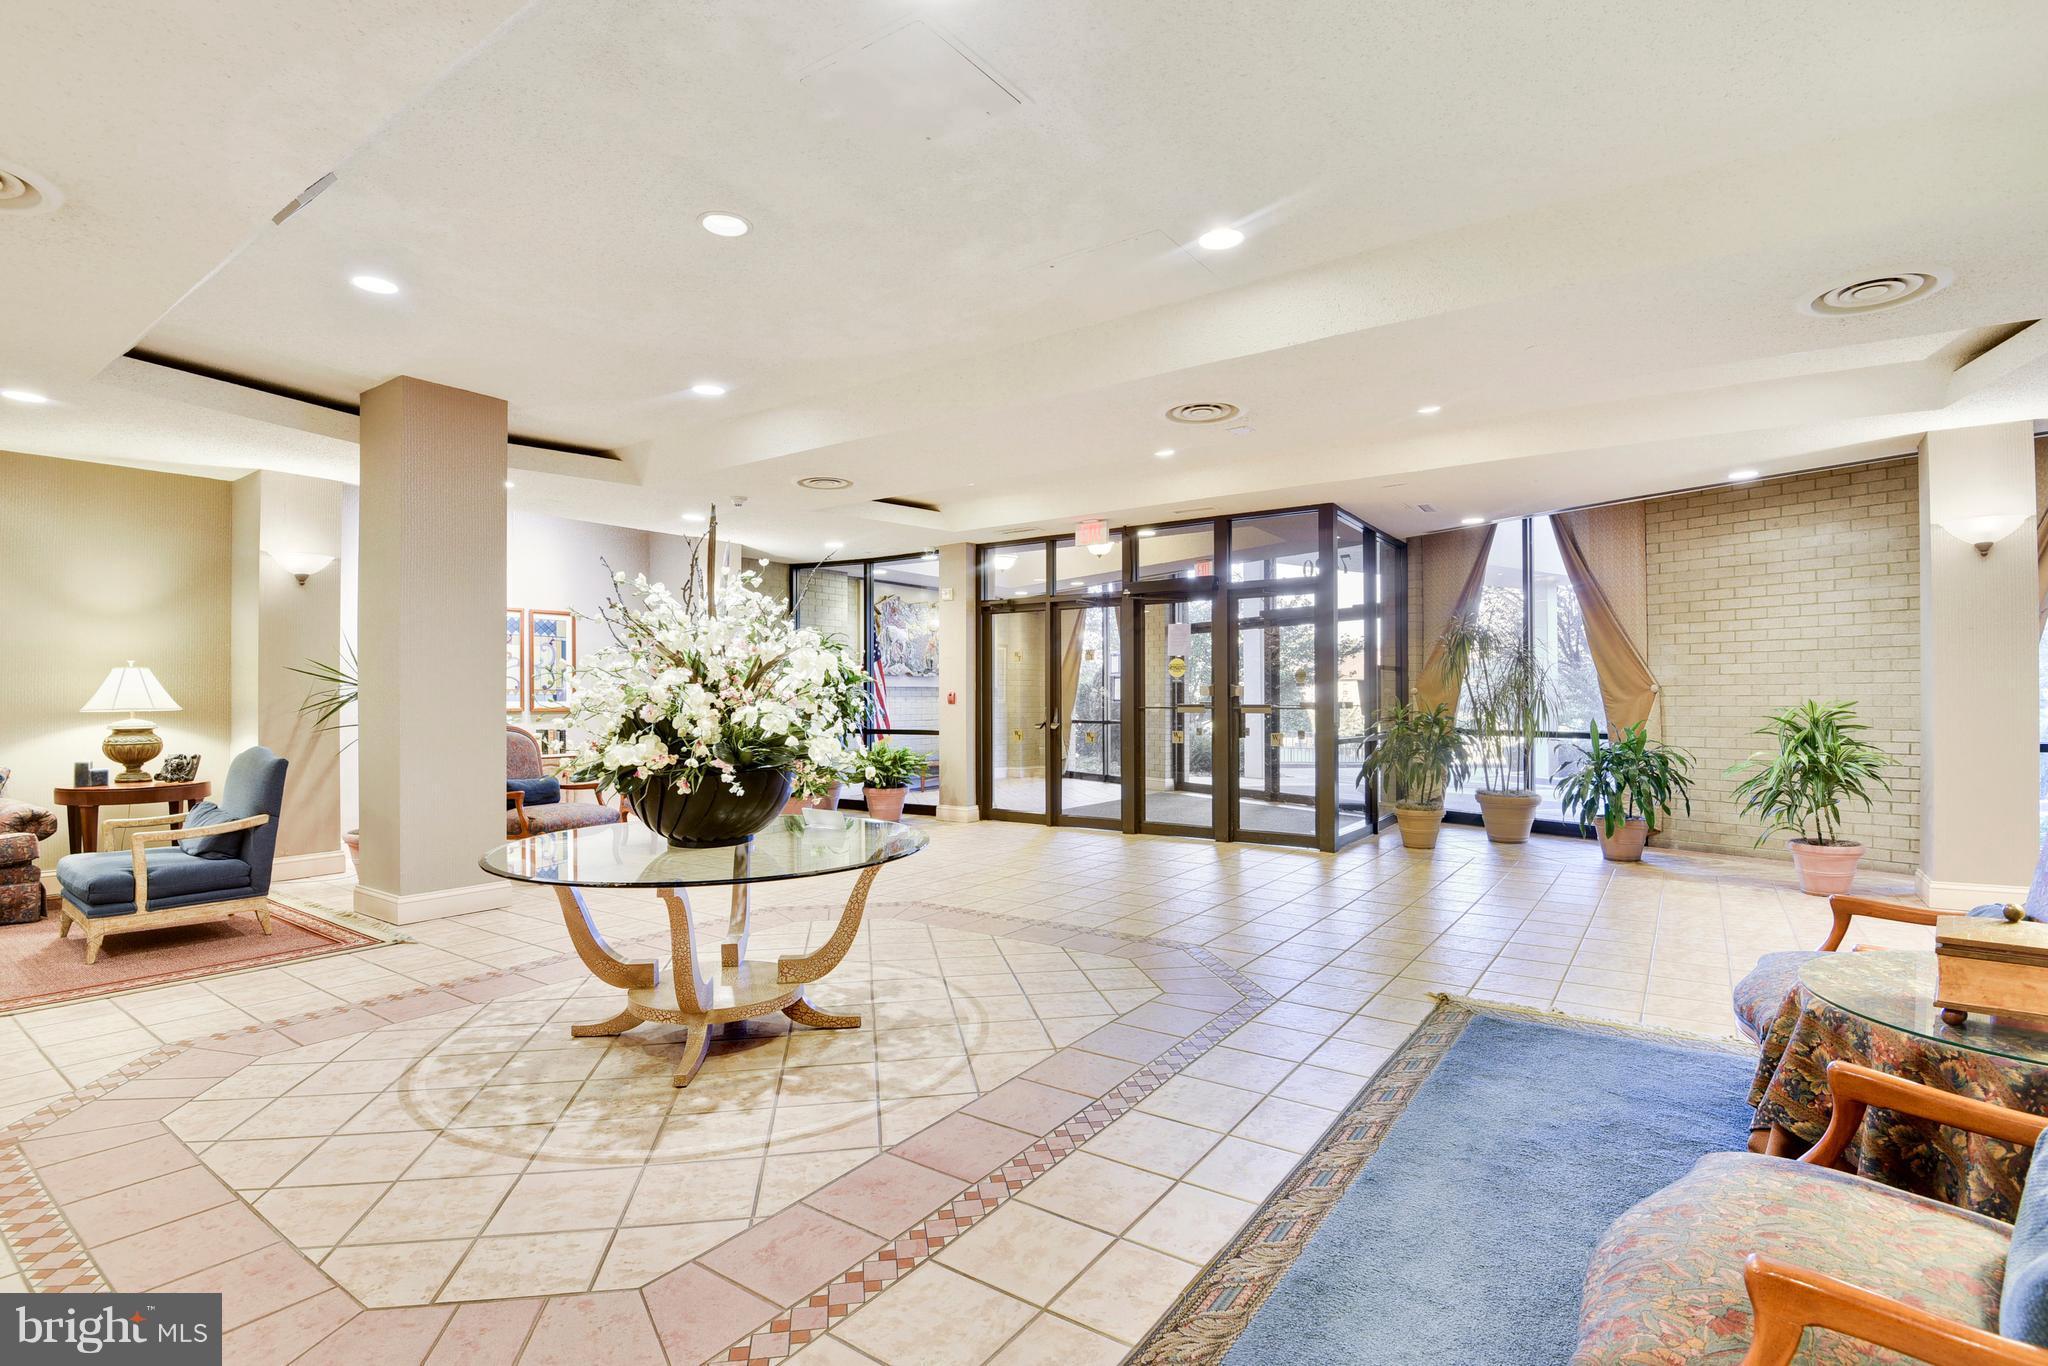 7420 Westlake Terrace 803 Bethesda 20817 Re Max Gateway